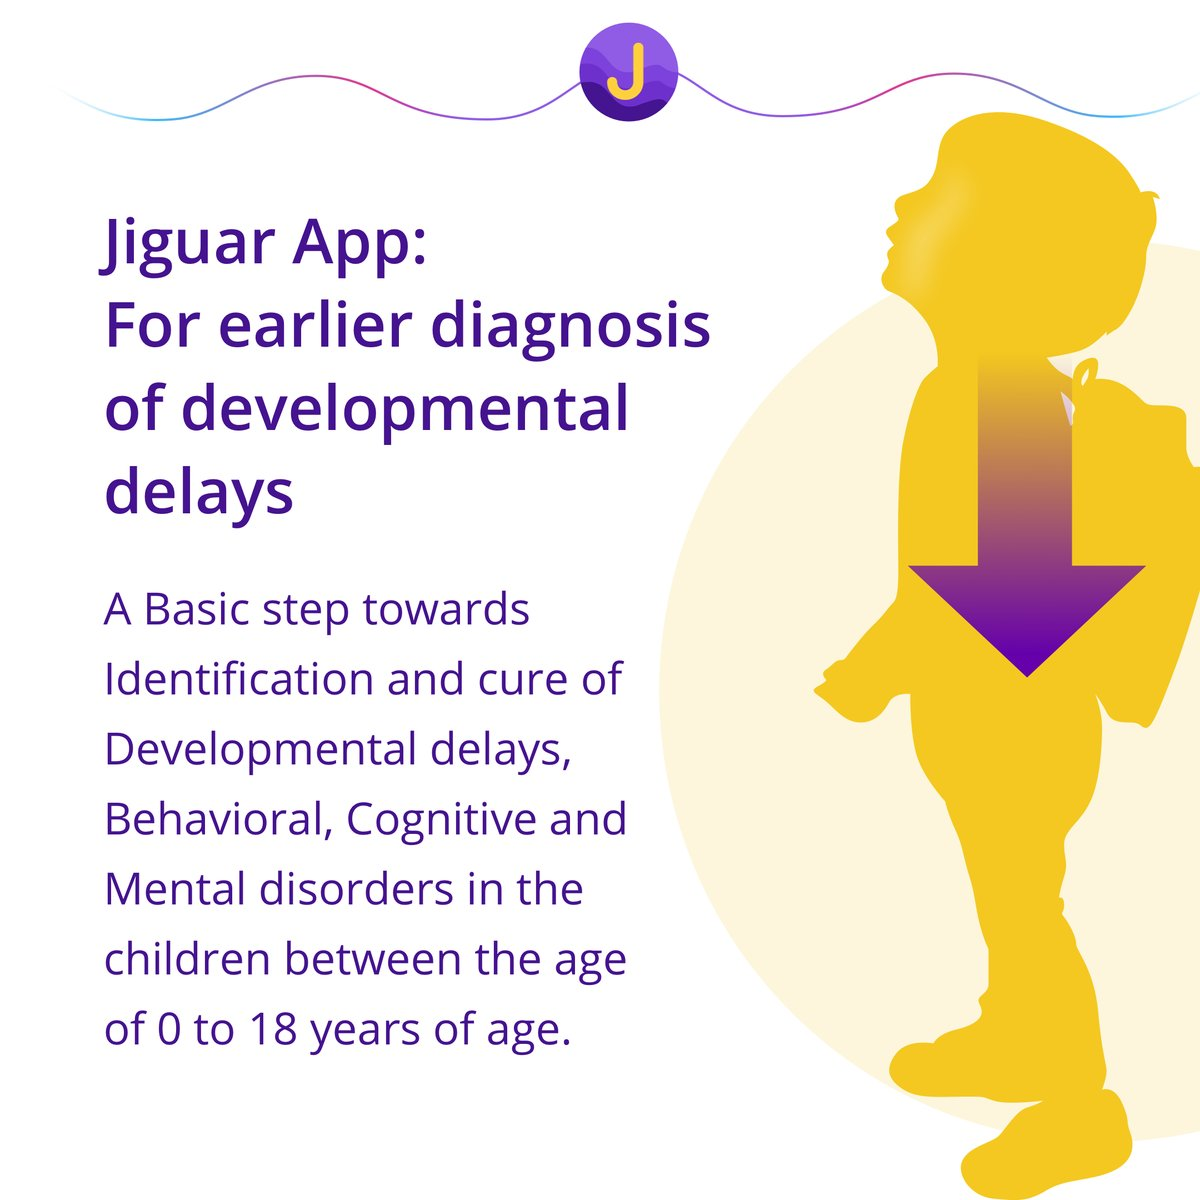 Jiguar App: For earlier diagnosis of developmental delays.  https://jiguar.com  #childmonitoringapp #developmentalmilestones #behaviortherapy #childbehavior #speechtherapy #developmentaldelays #autismawareness #autismspeaks #autism @JiguarIncpic.twitter.com/FVTvnc4pas